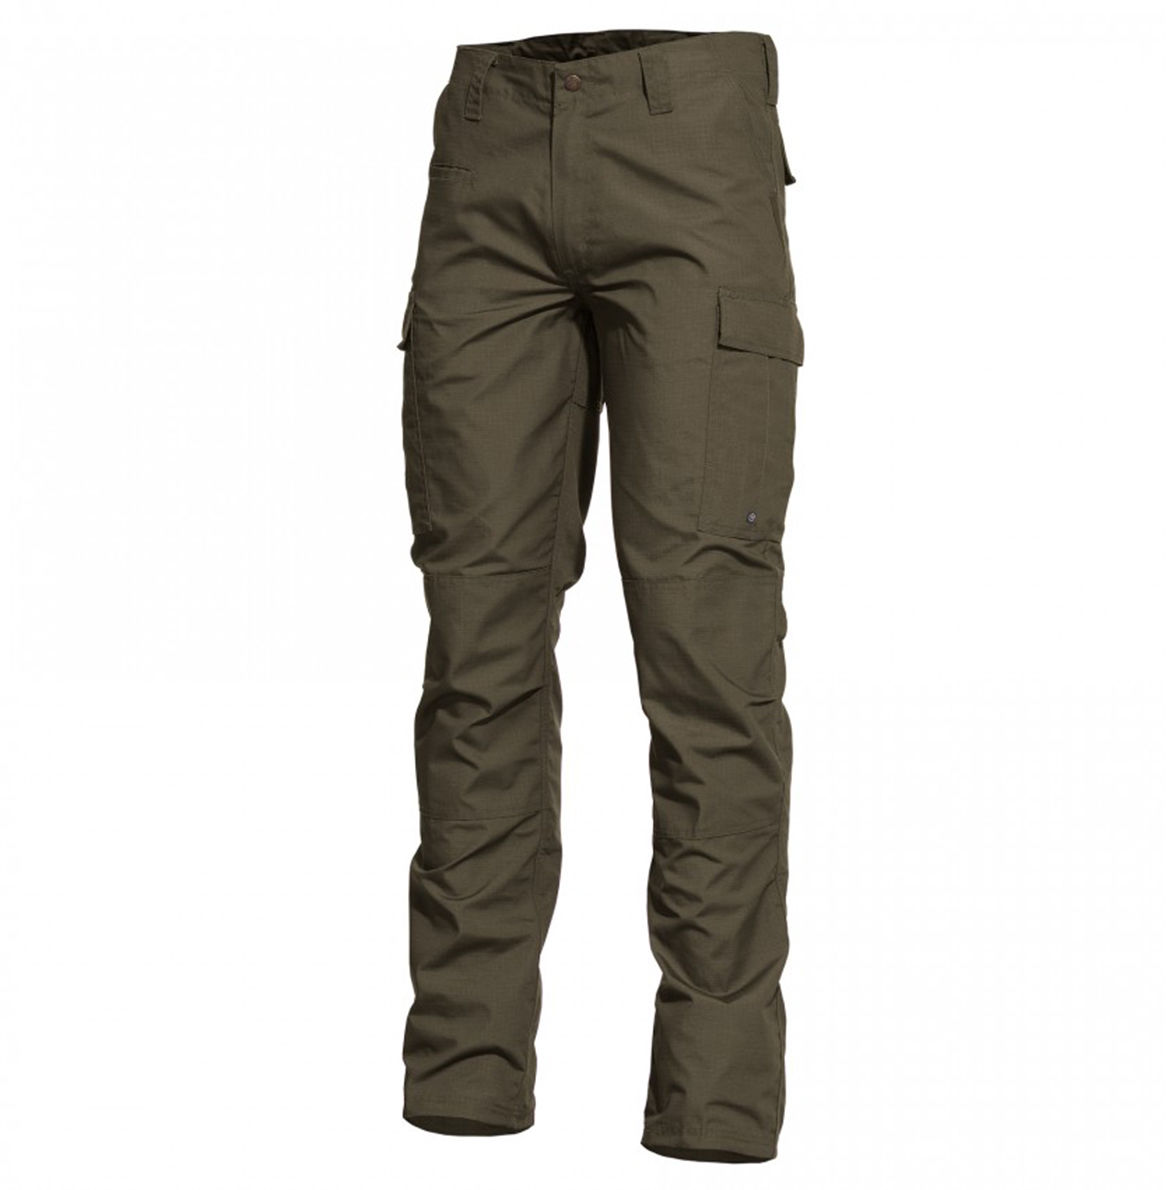 Spodnie wojskowe Pentagon BDU 2.0 Ranger Green (K05001-2.0-06RG)